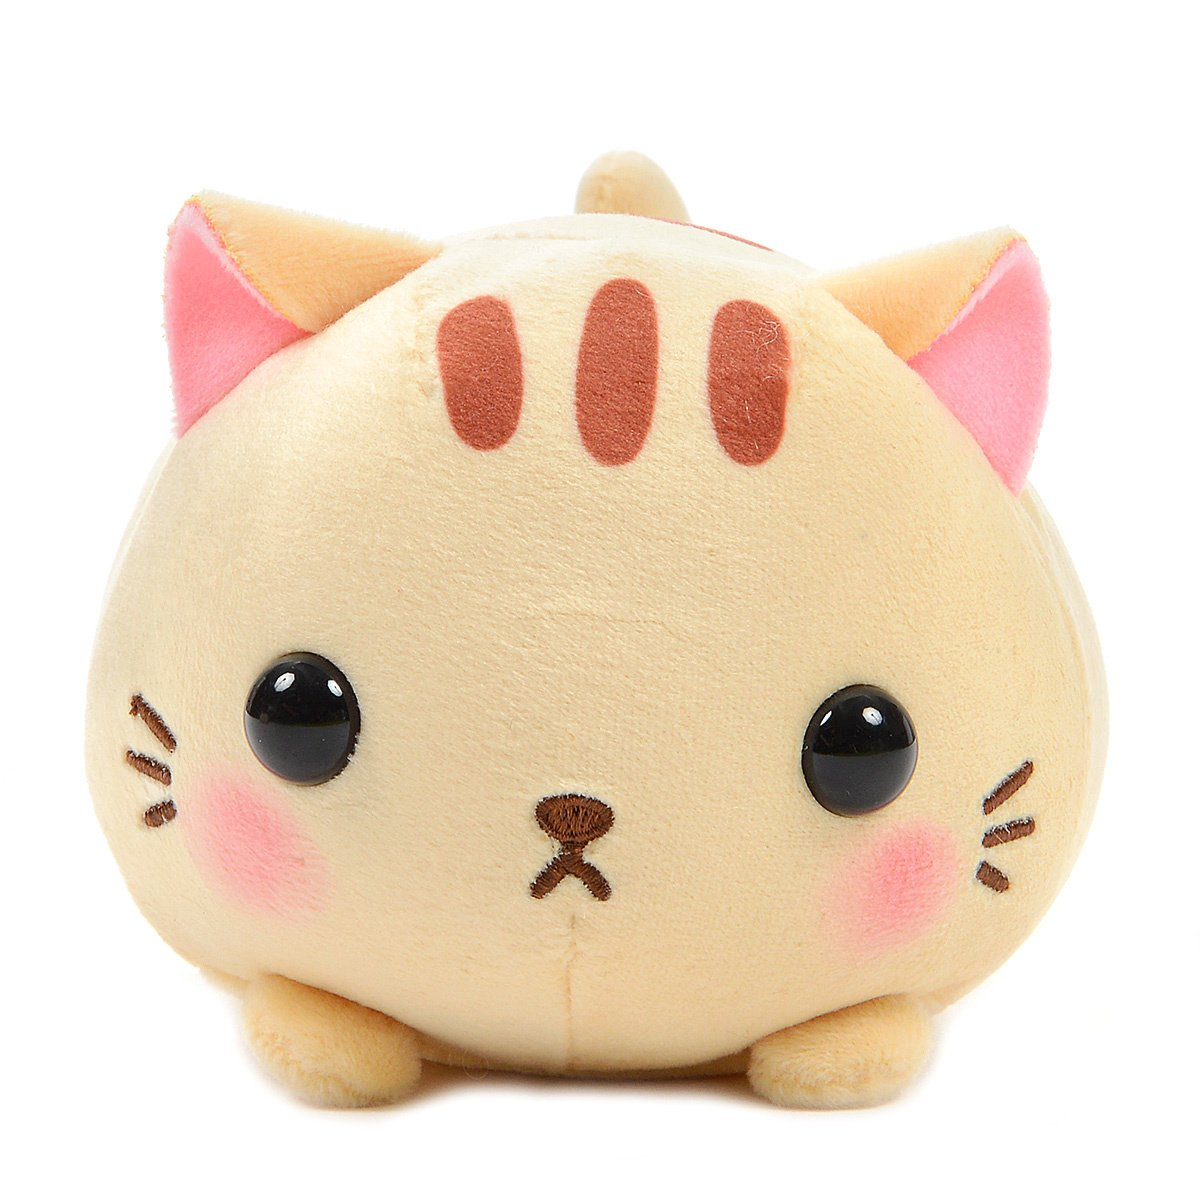 Mochikko Neko Nyanzu Orange Cat Plush Amuse Super Soft Japan Standard Size Tora-nyan